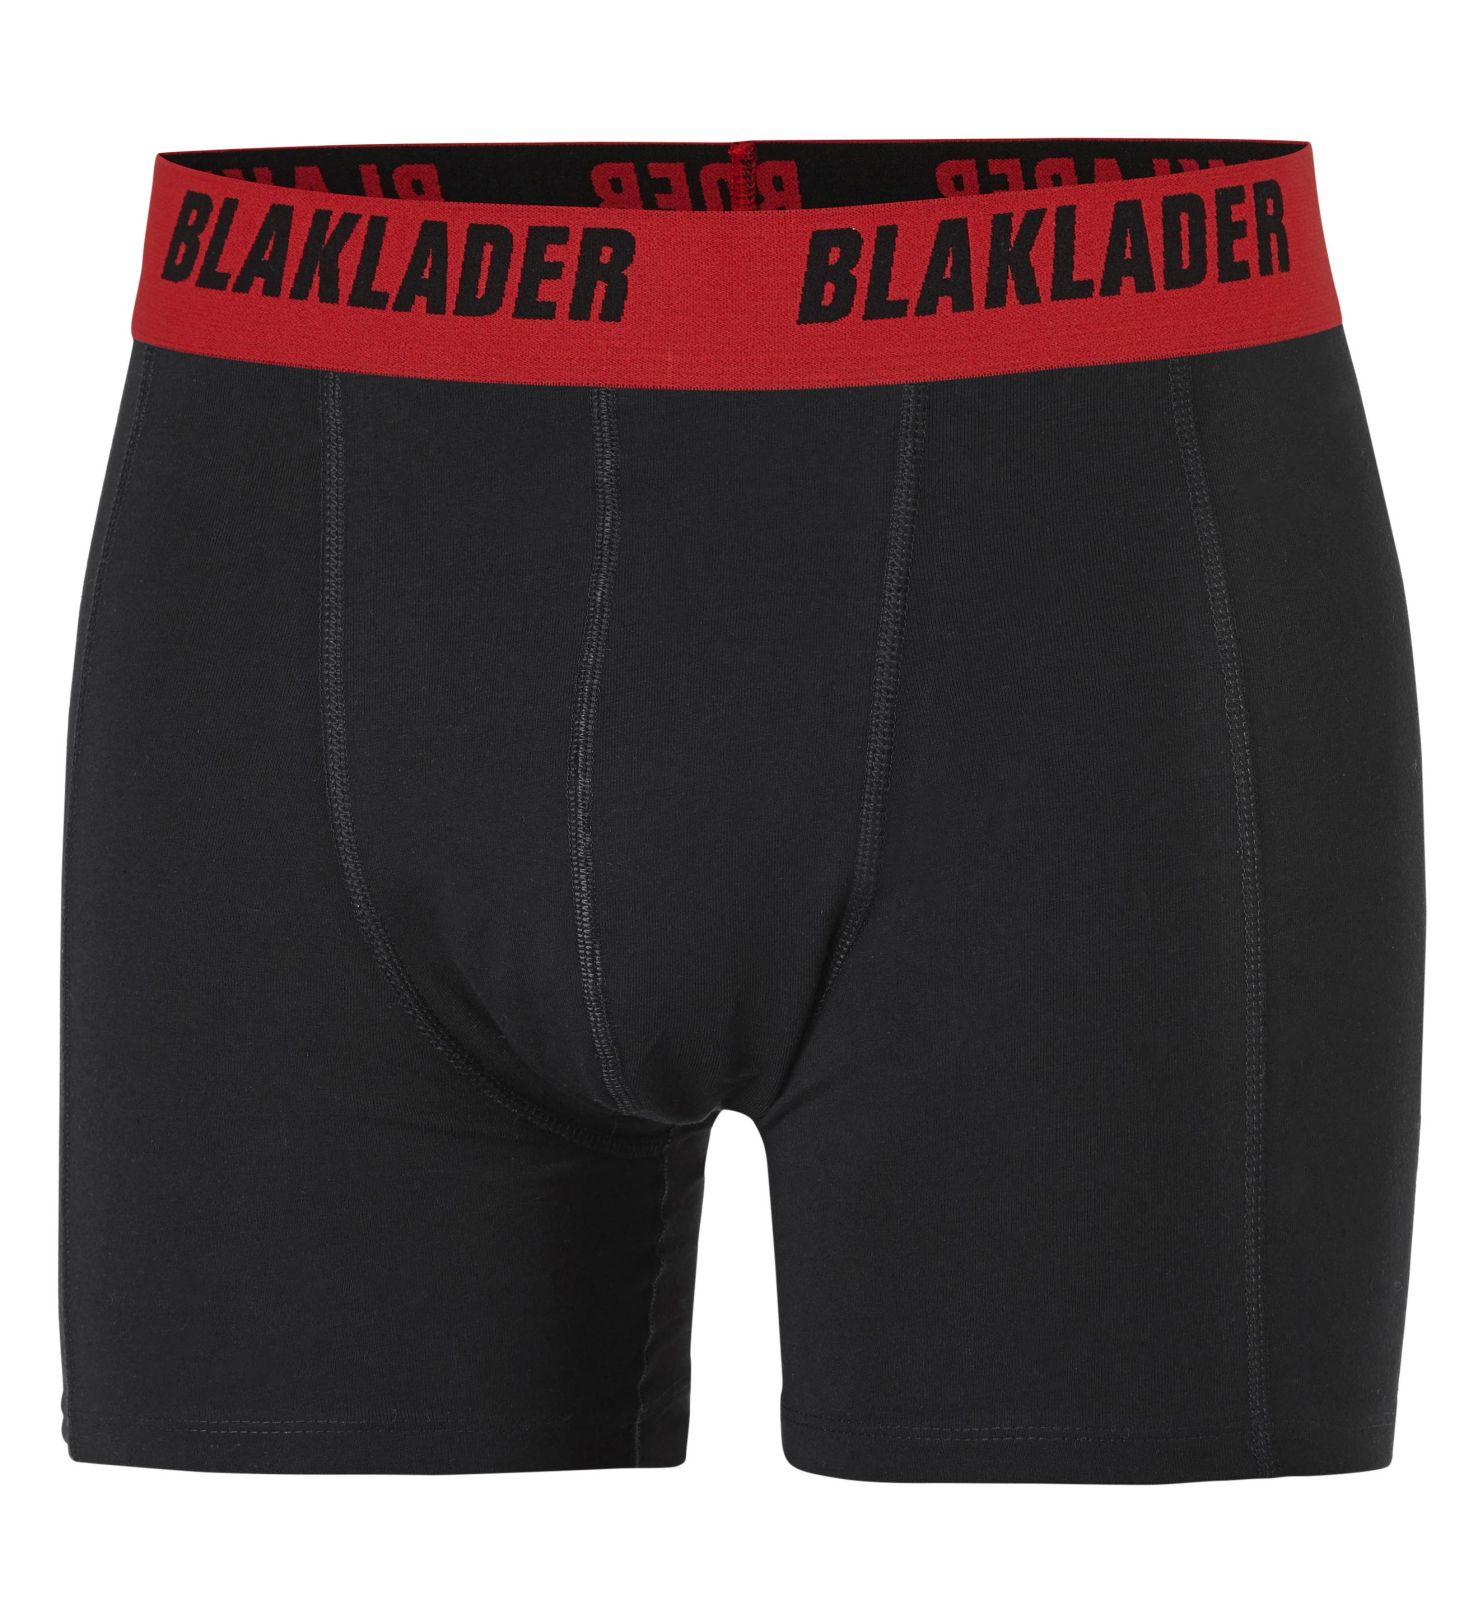 Blaklader Boxershorts 18971166 2-pack wit-rood(1056)